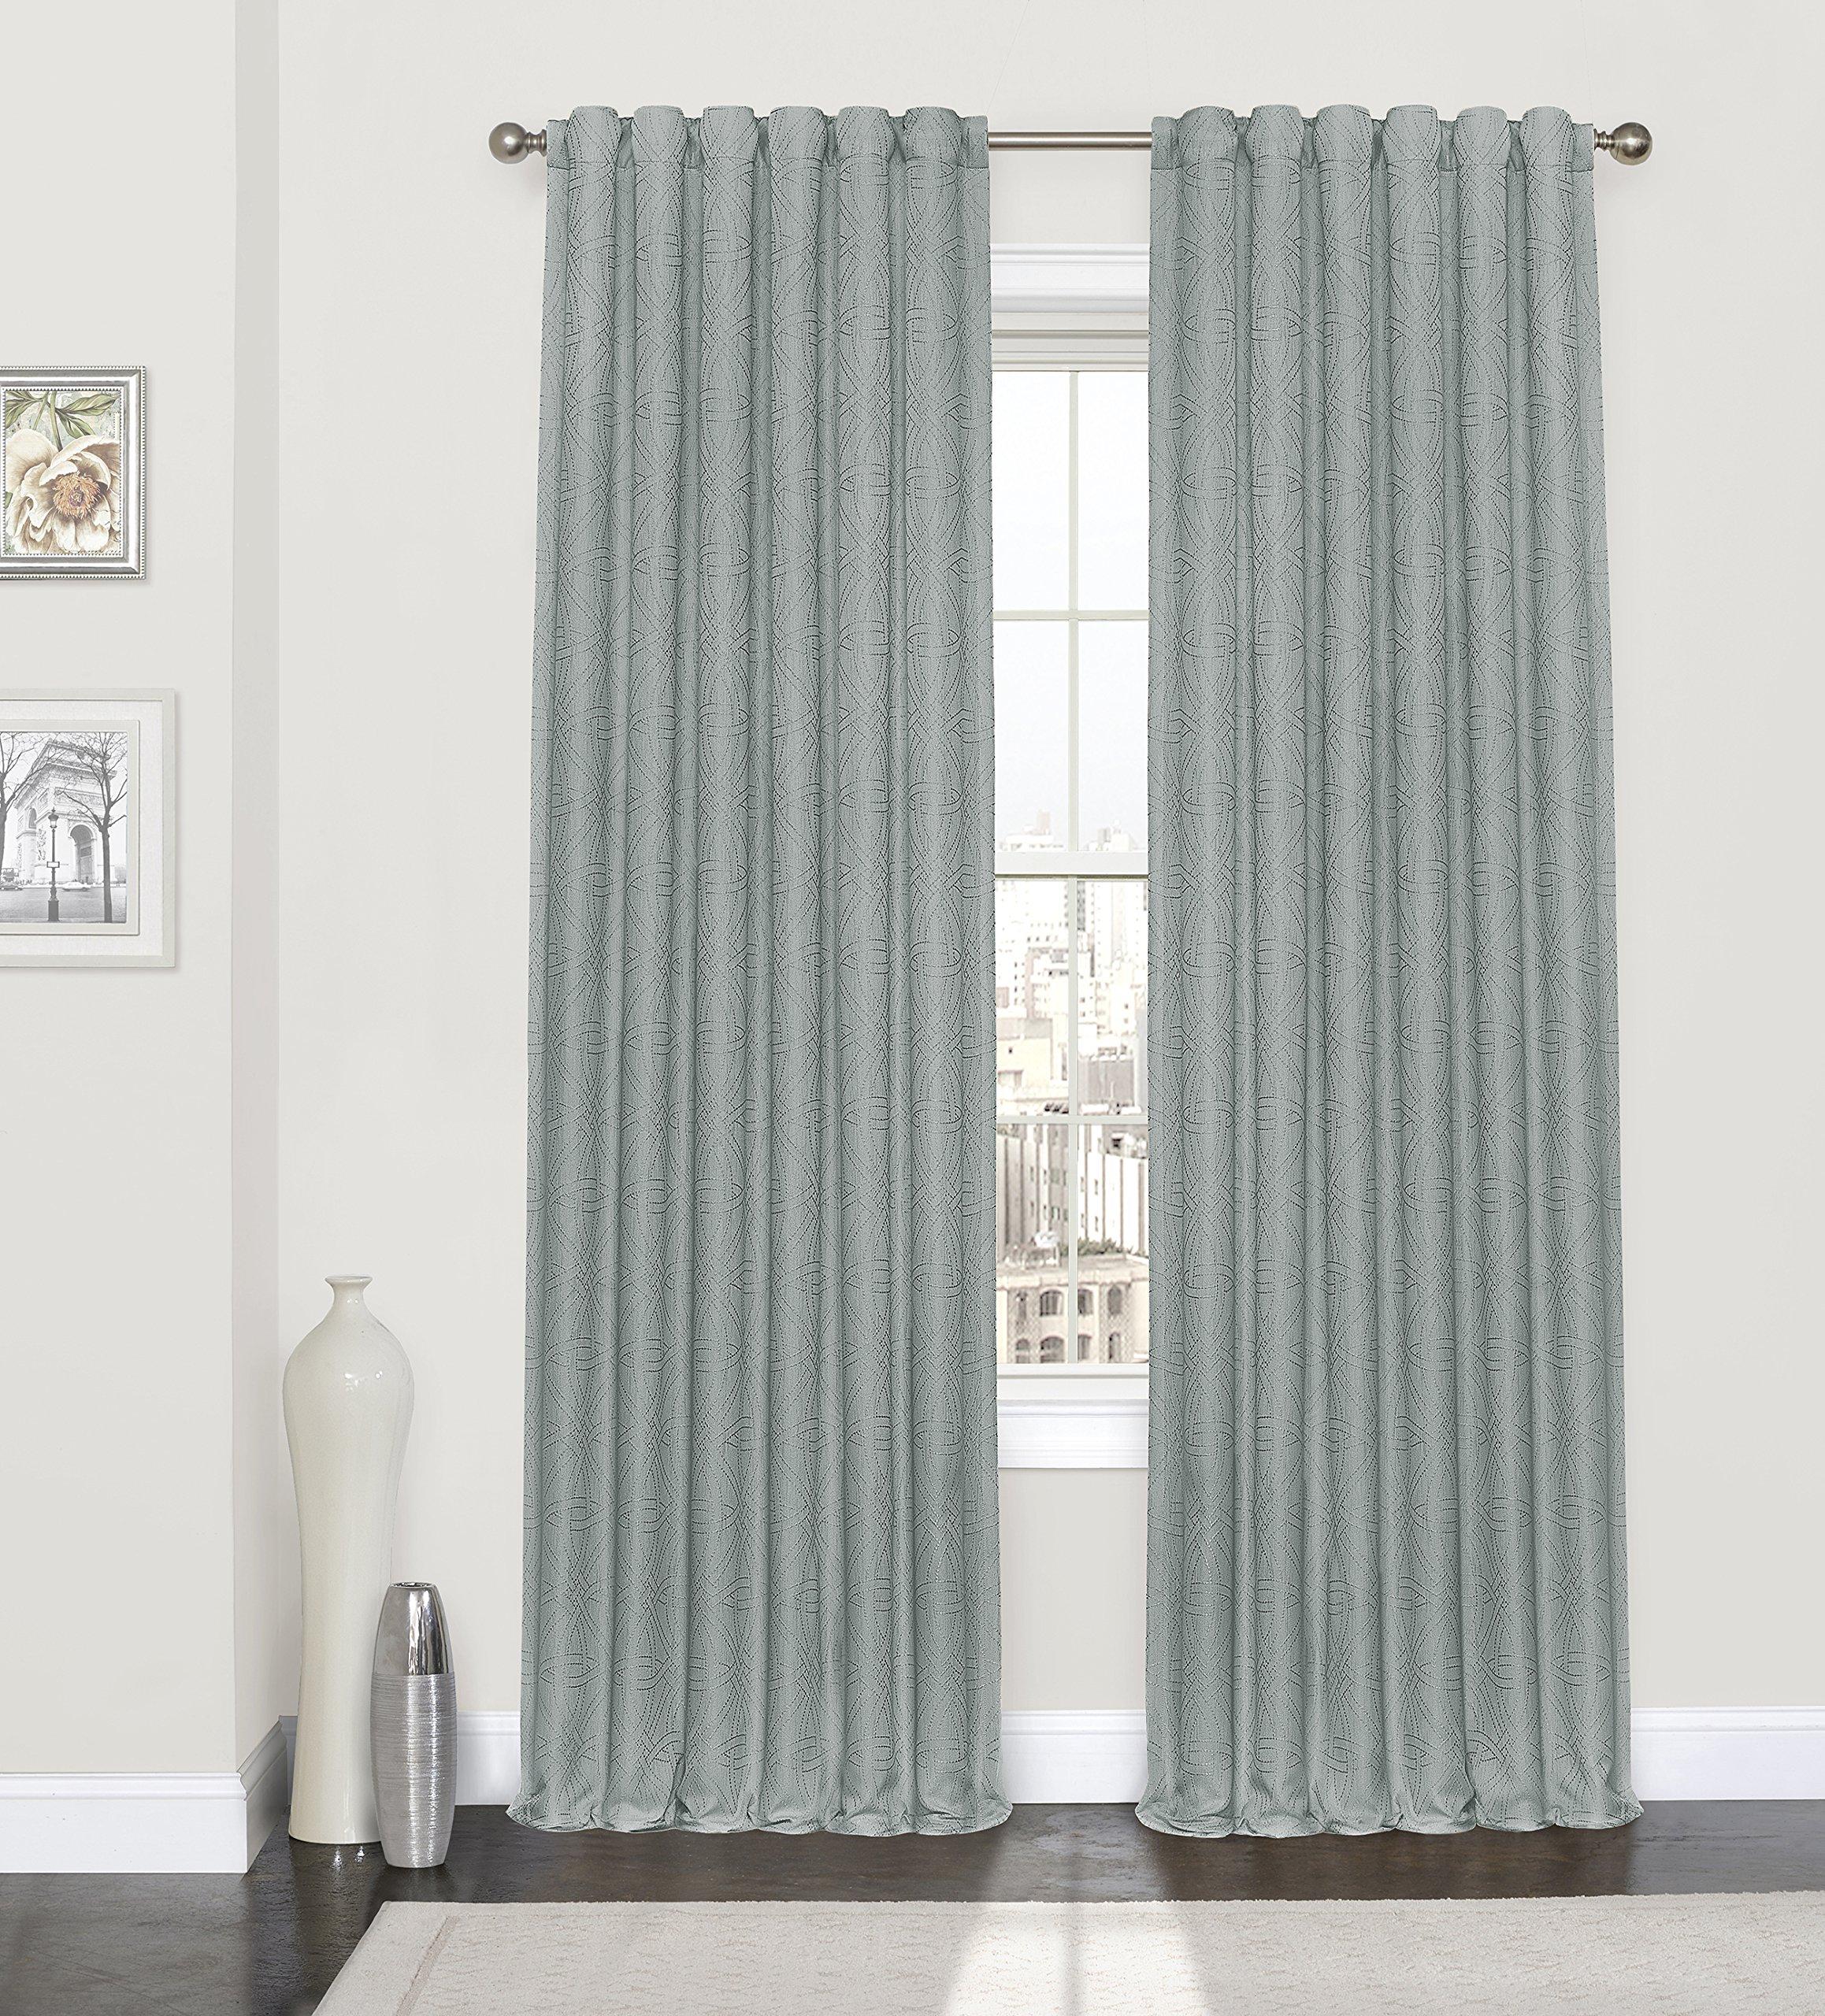 Eclipse Kiernan Window Curtain, 52x84, Spa